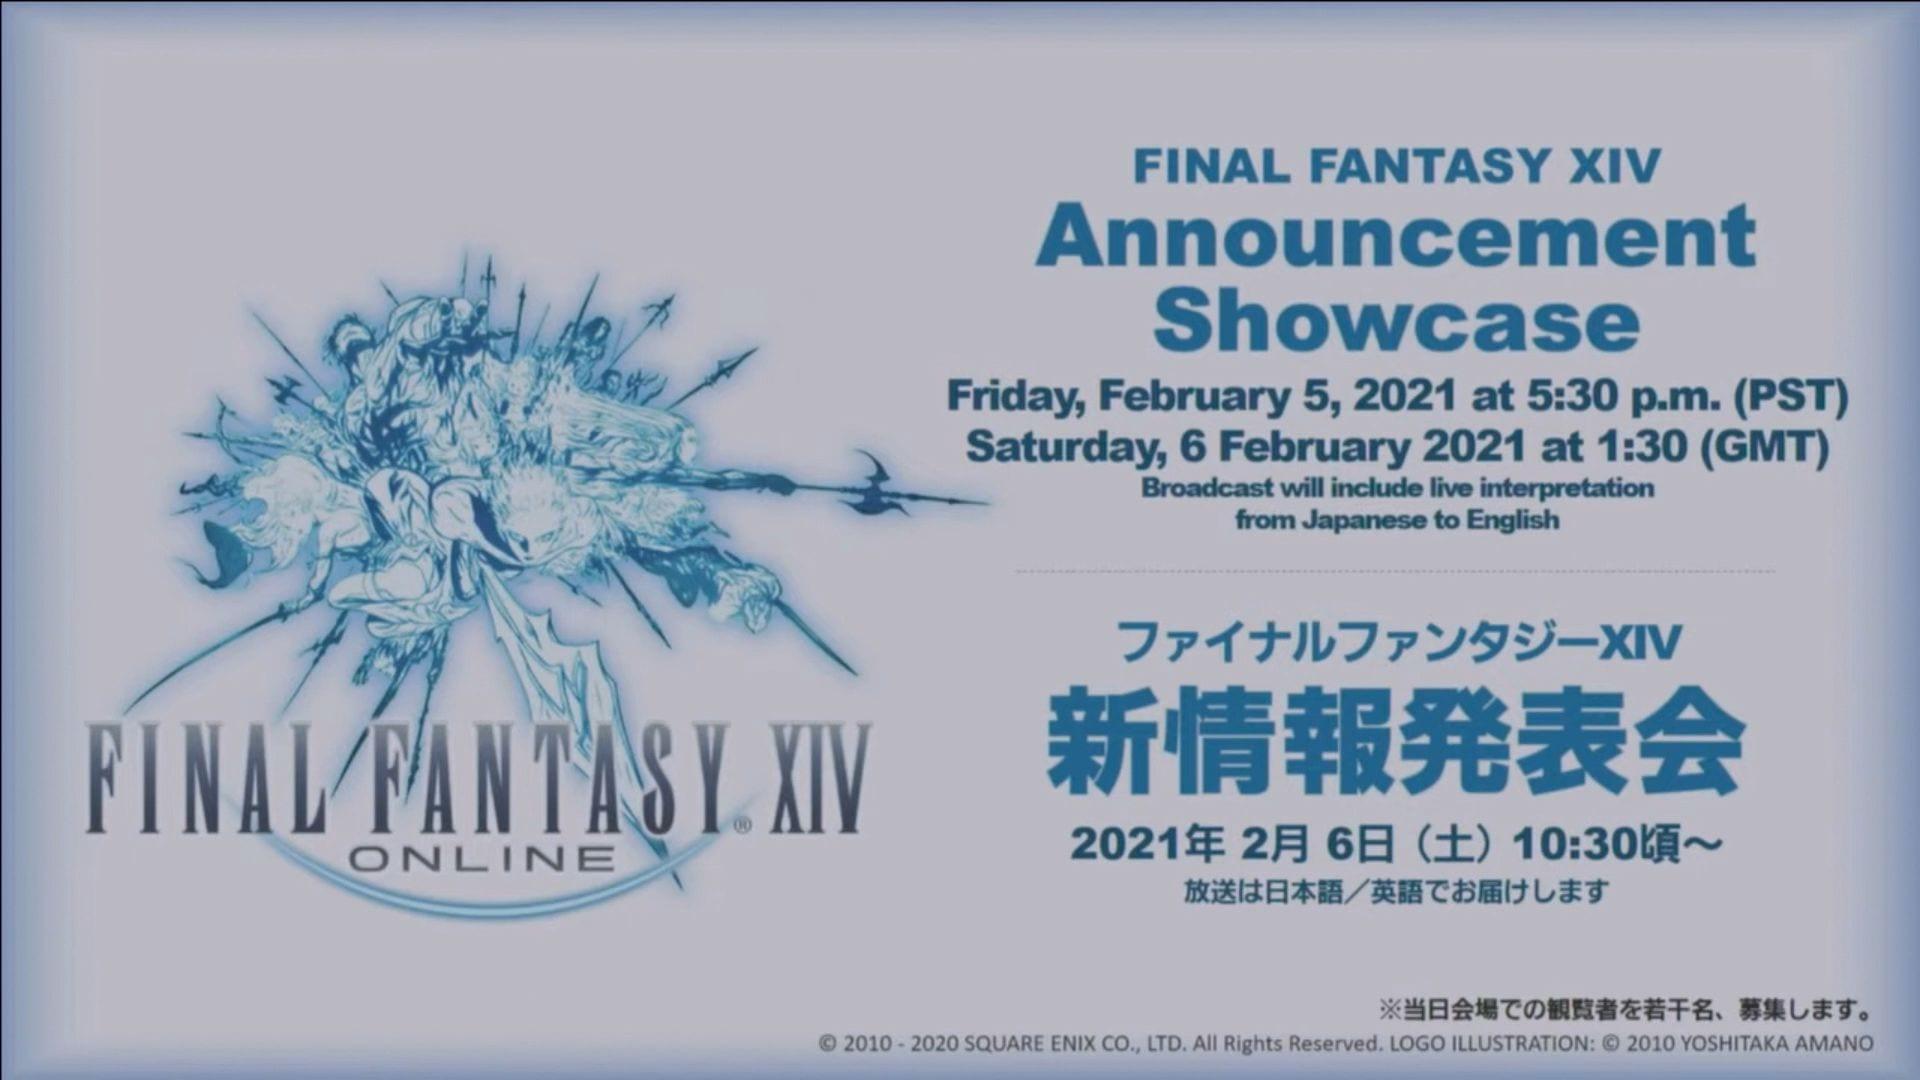 Final-Fantasy-XIV-Screenshot-2020-11-27-15-04-25.jpg?ssl=1